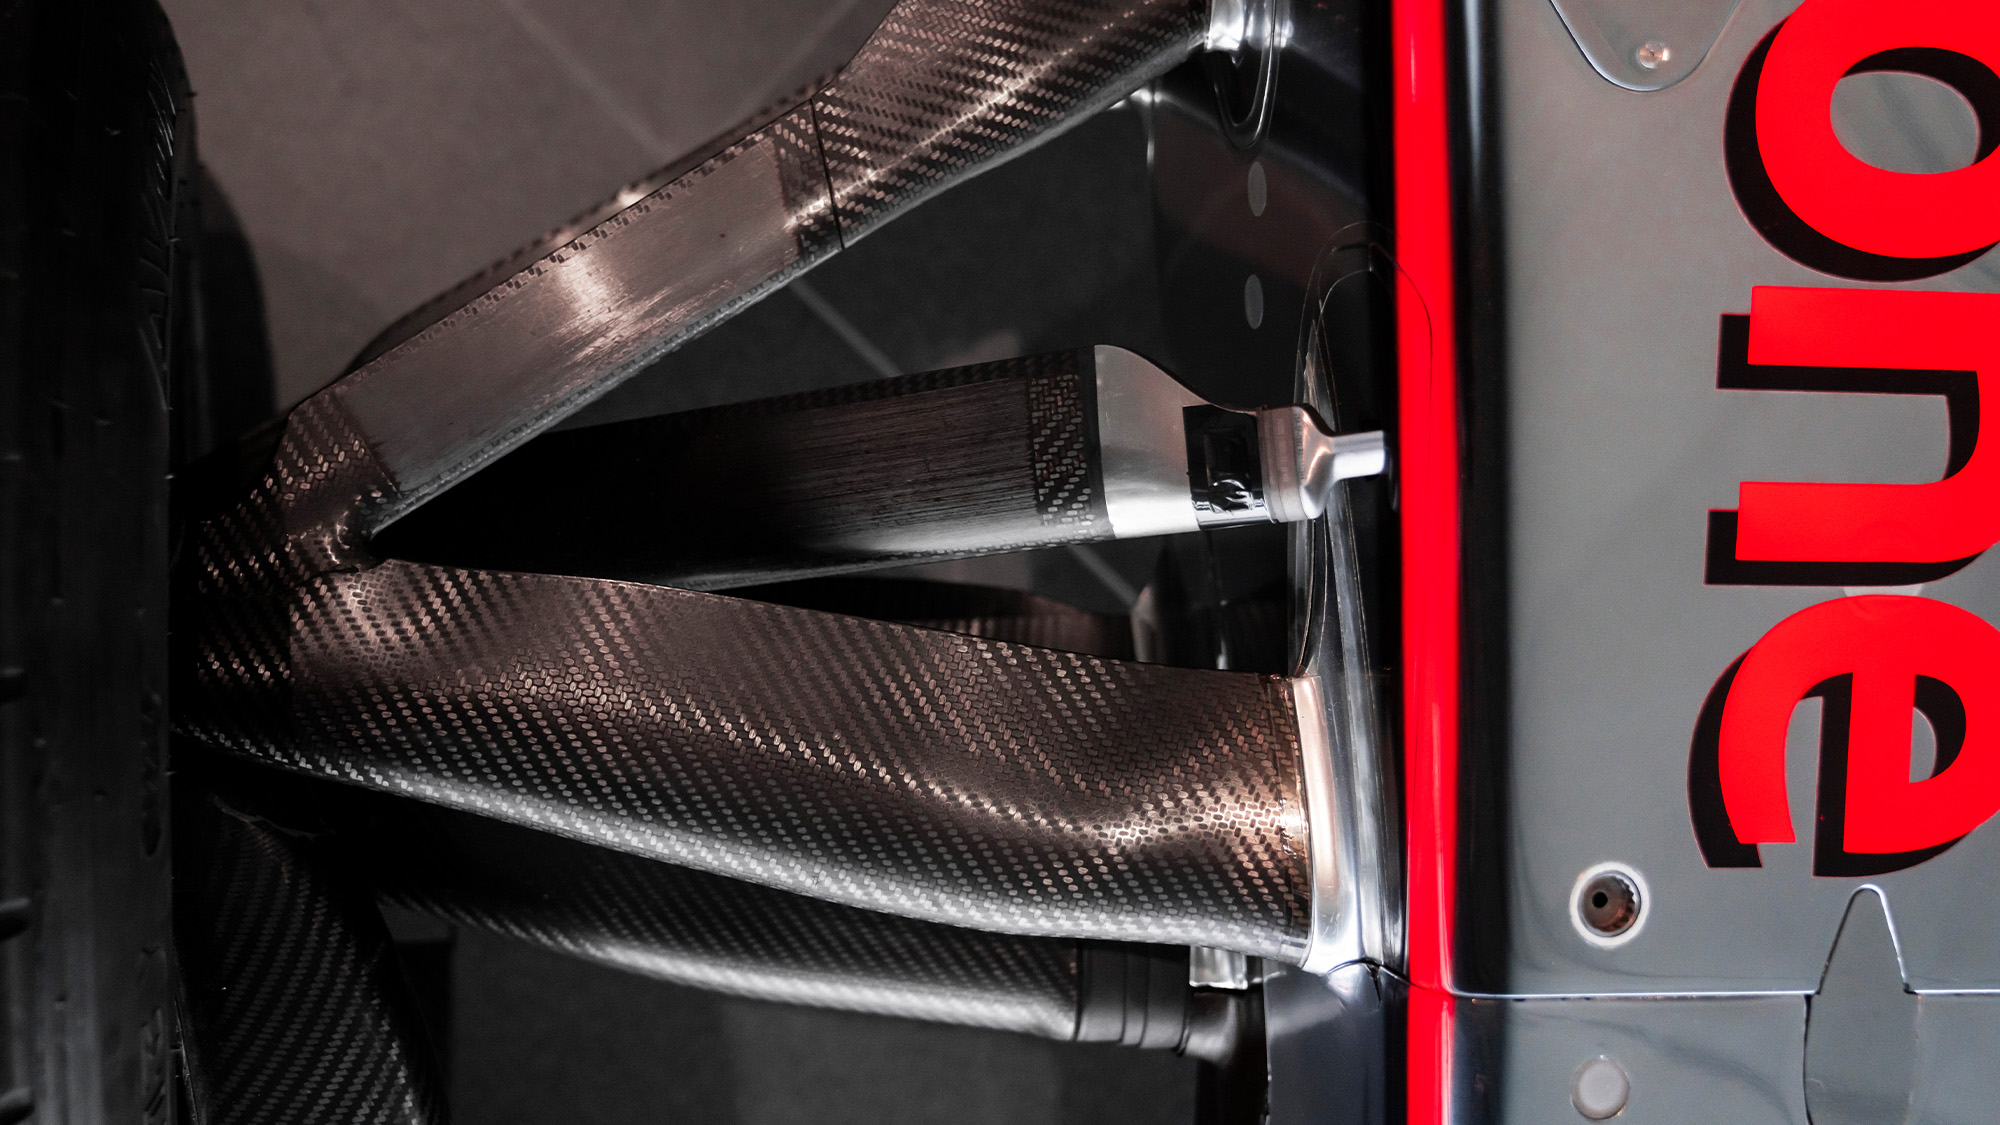 Lewis Hamilton McLaren MP4-25 for auction suspension